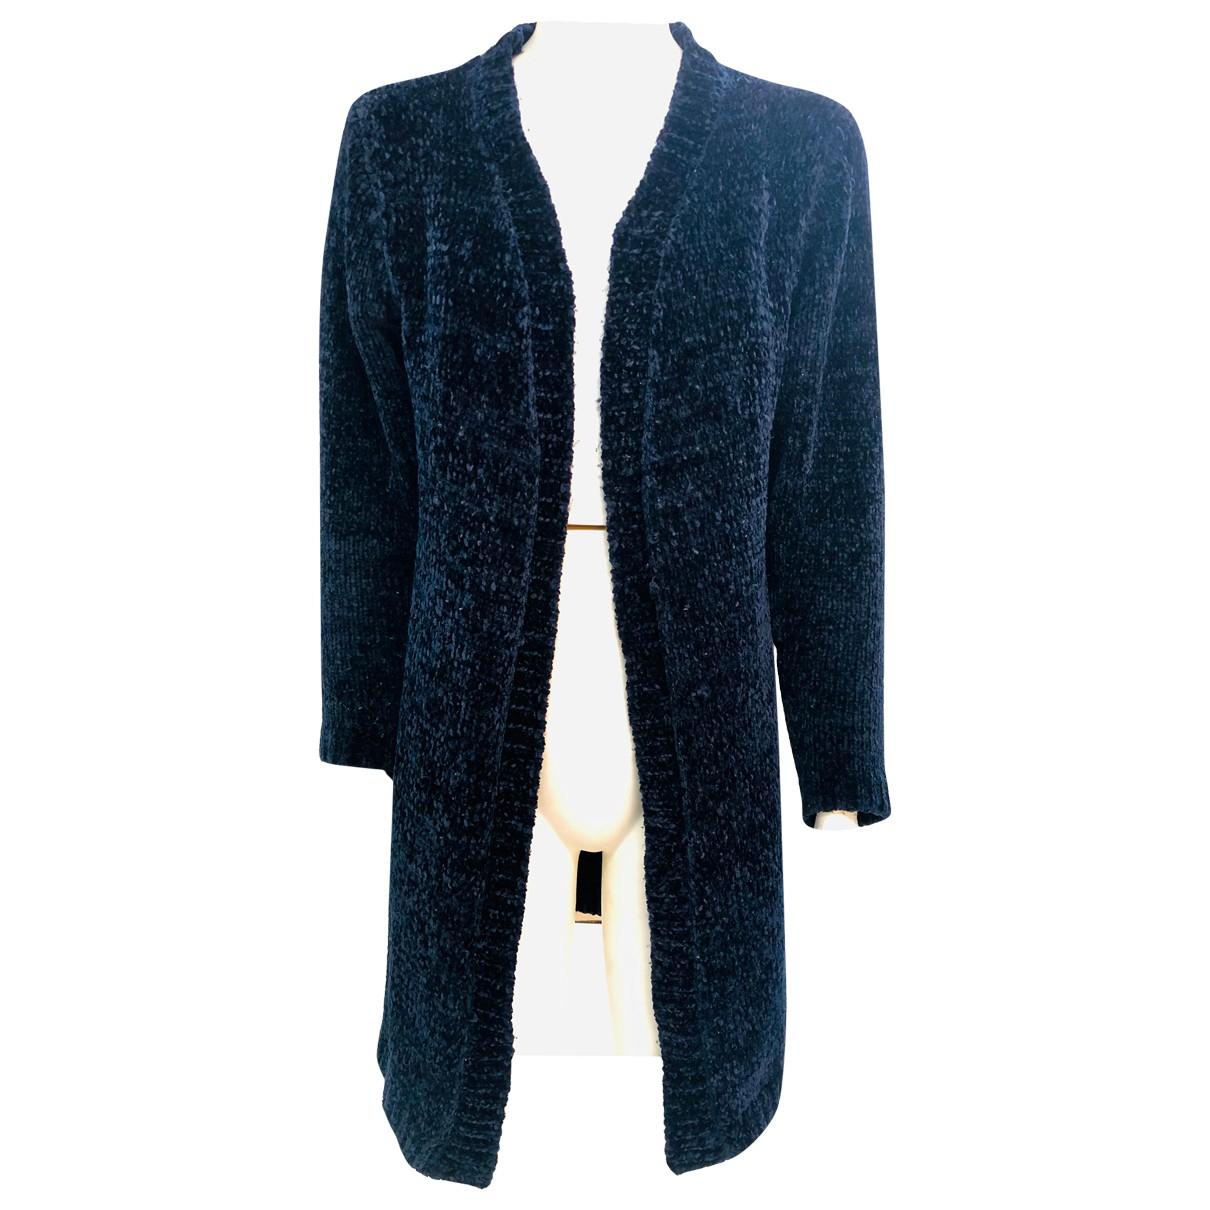 Autre Marque N Blue Knitwear for Women M International